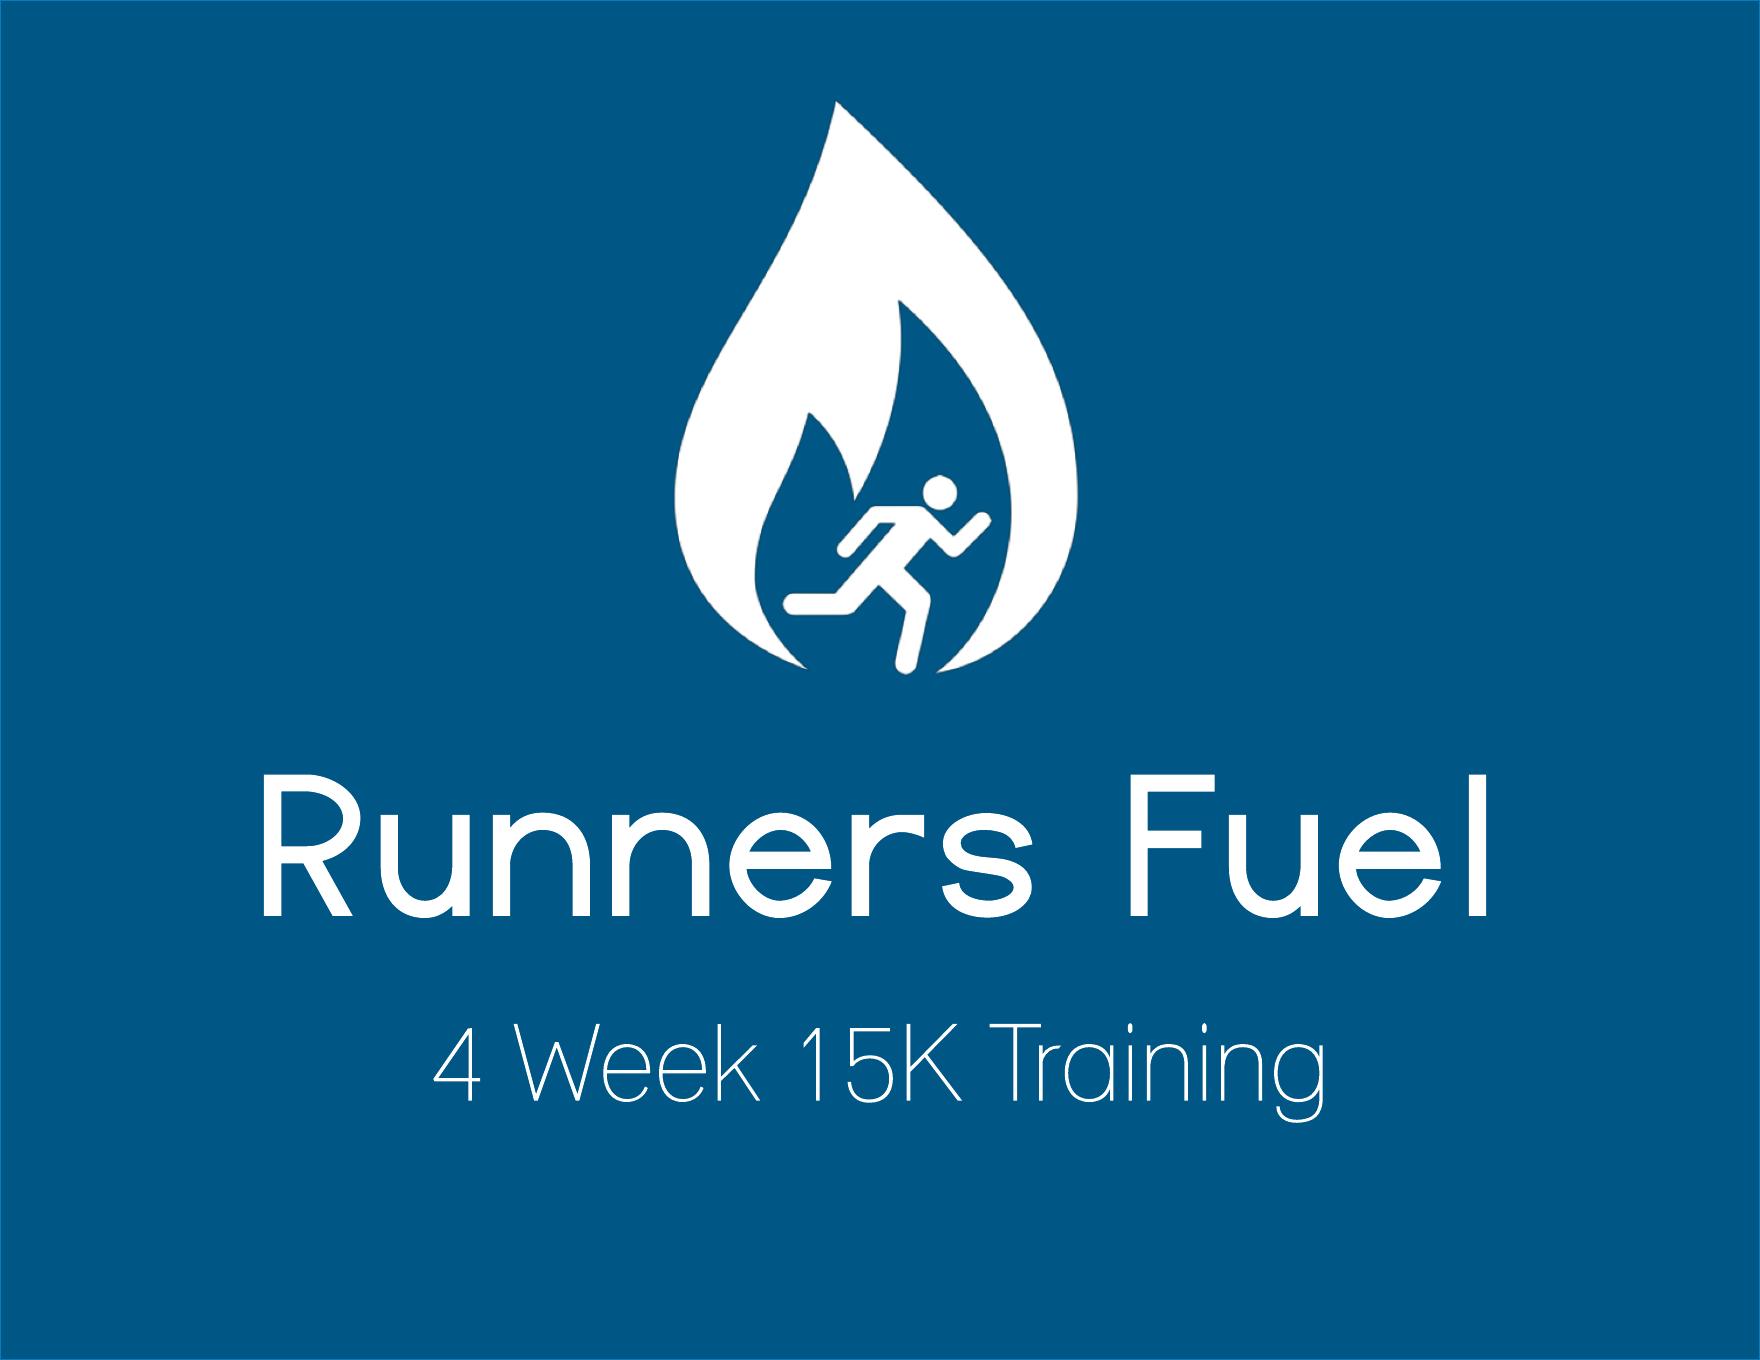 15k 4 Week Training Guide